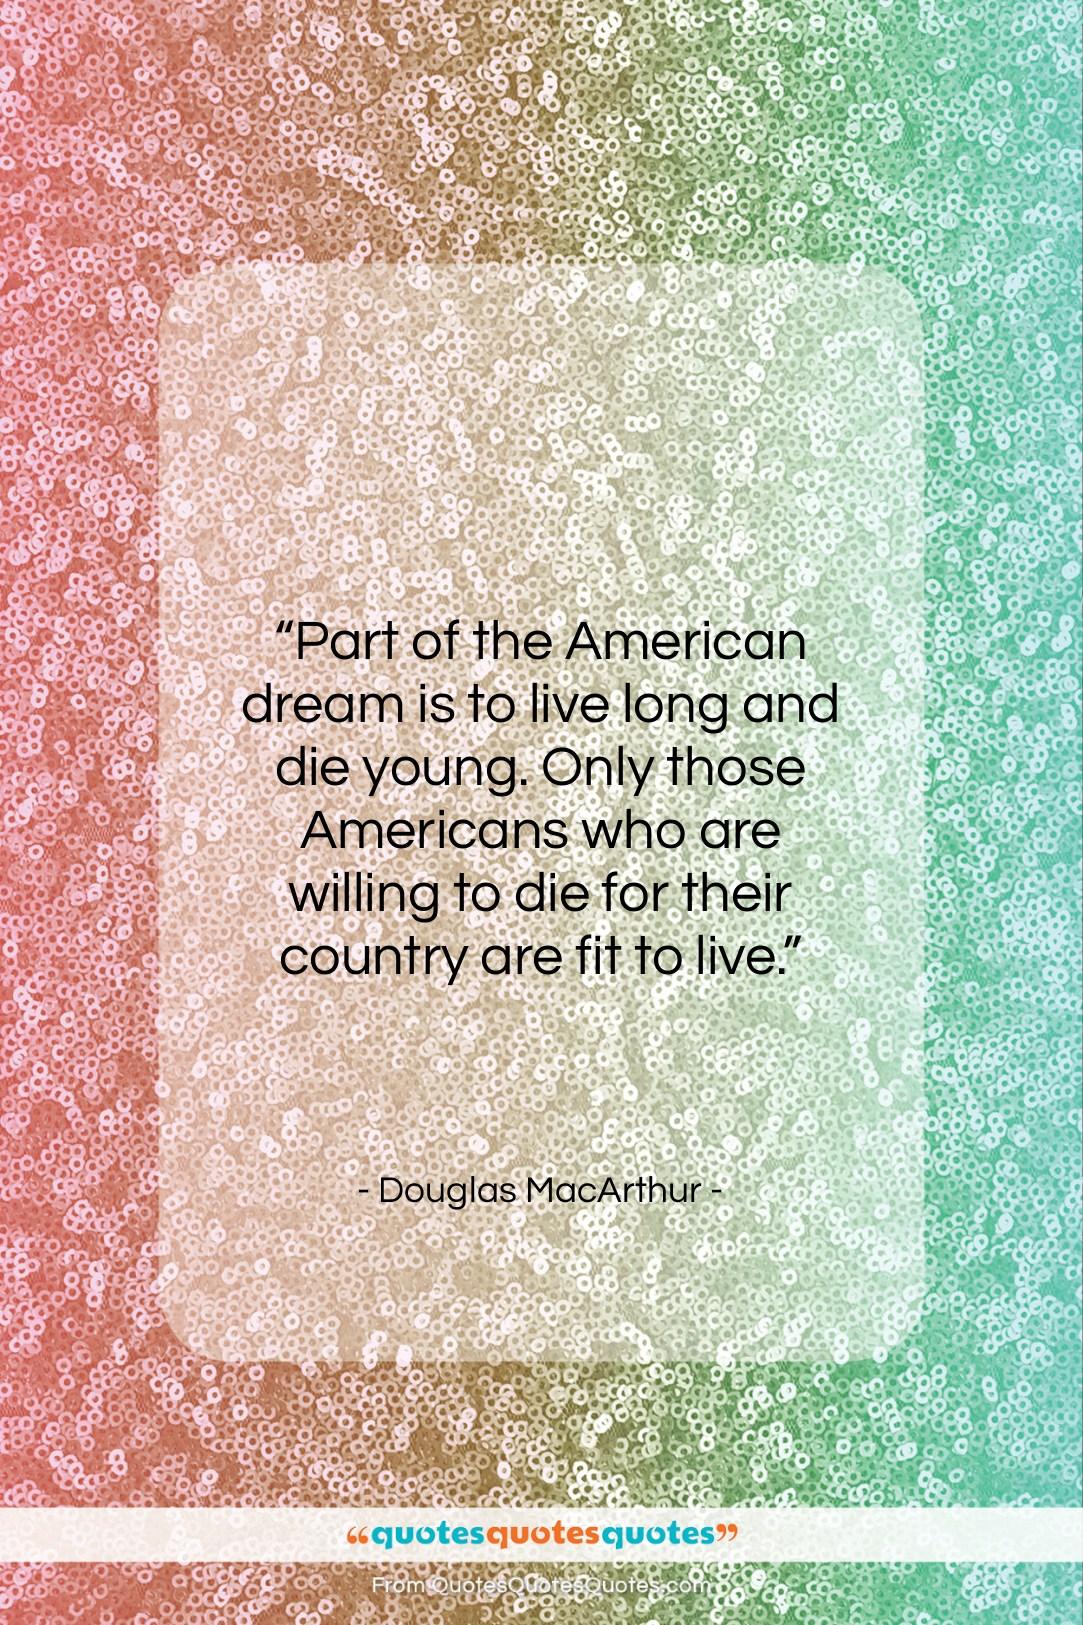 Douglas Macarthur Quotes 5